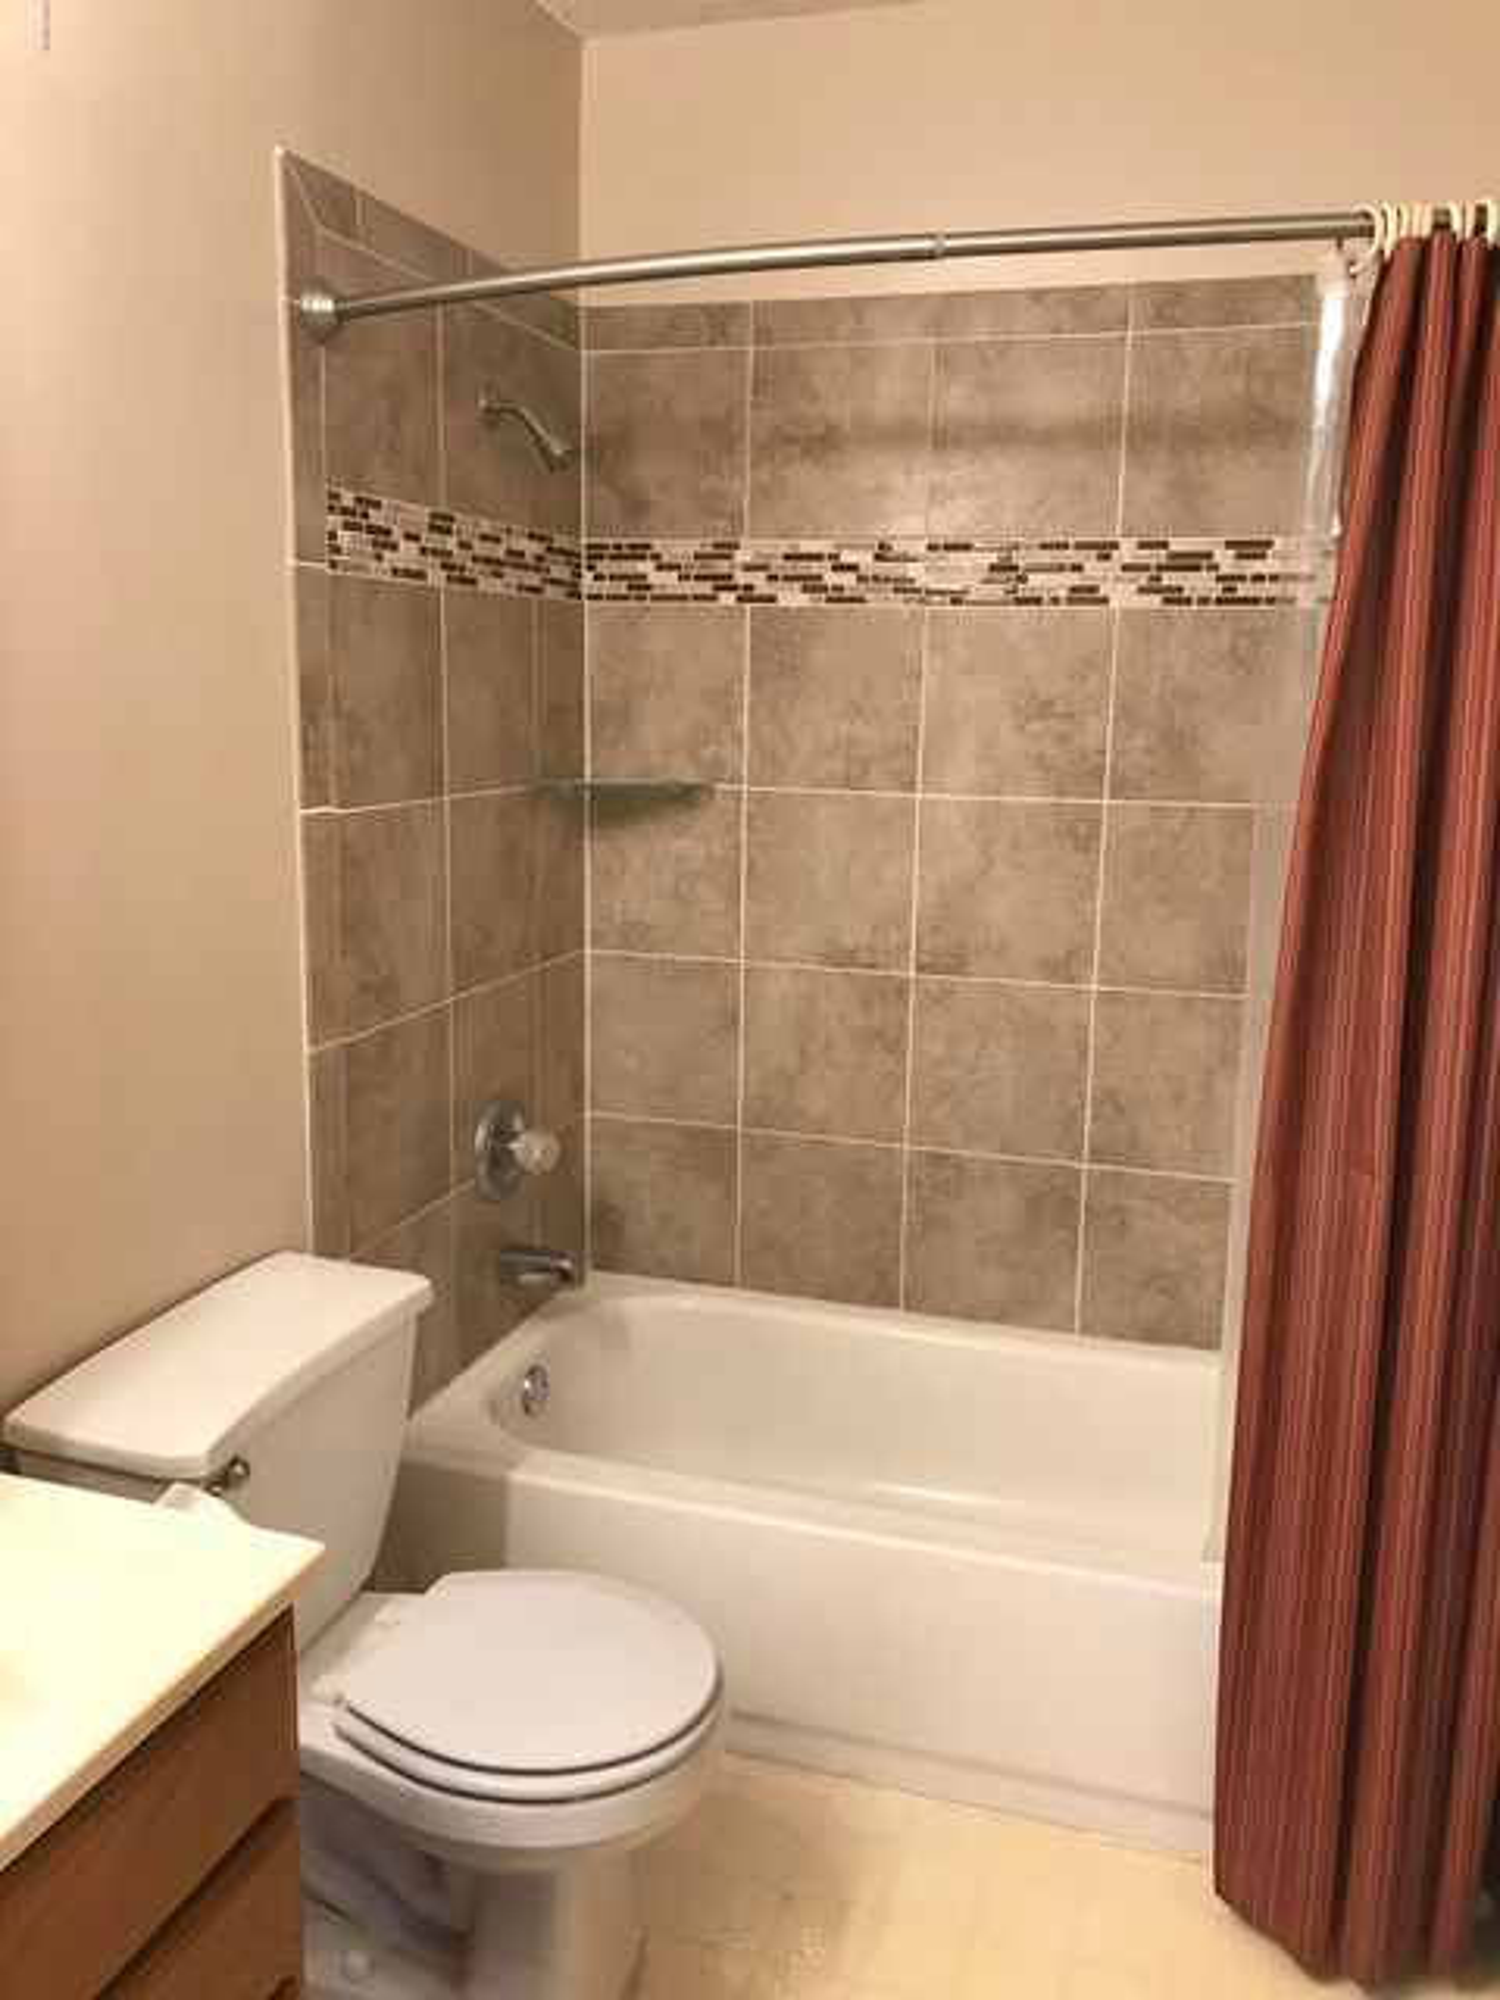 654 S Andrew Drive,New London,5 Bedrooms Bedrooms,3 BathroomsBathrooms,Single Family,S Andrew Drive,6031219